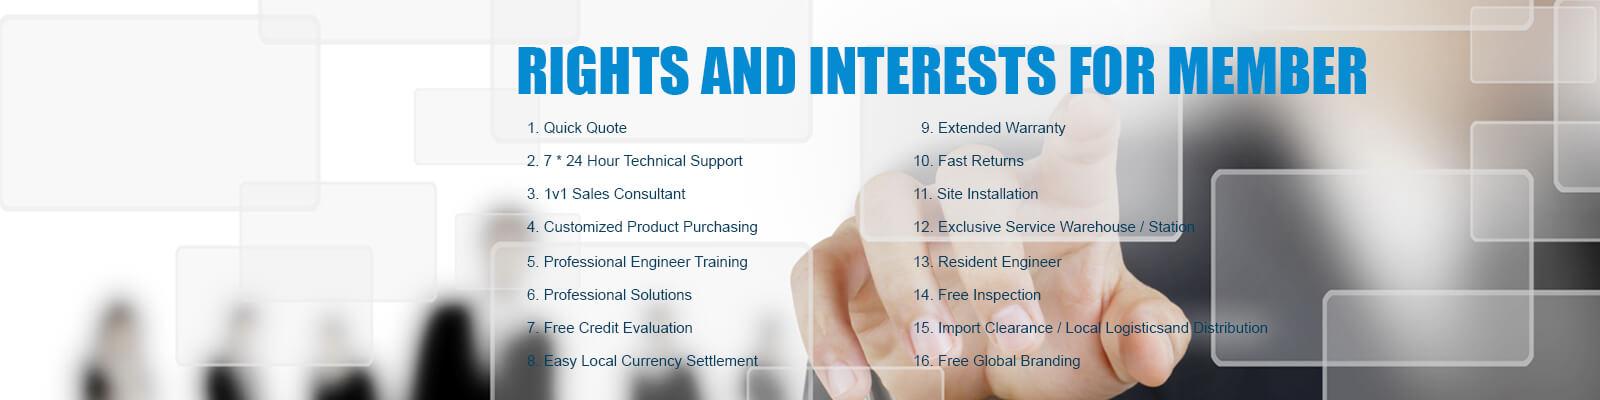 Membership rights